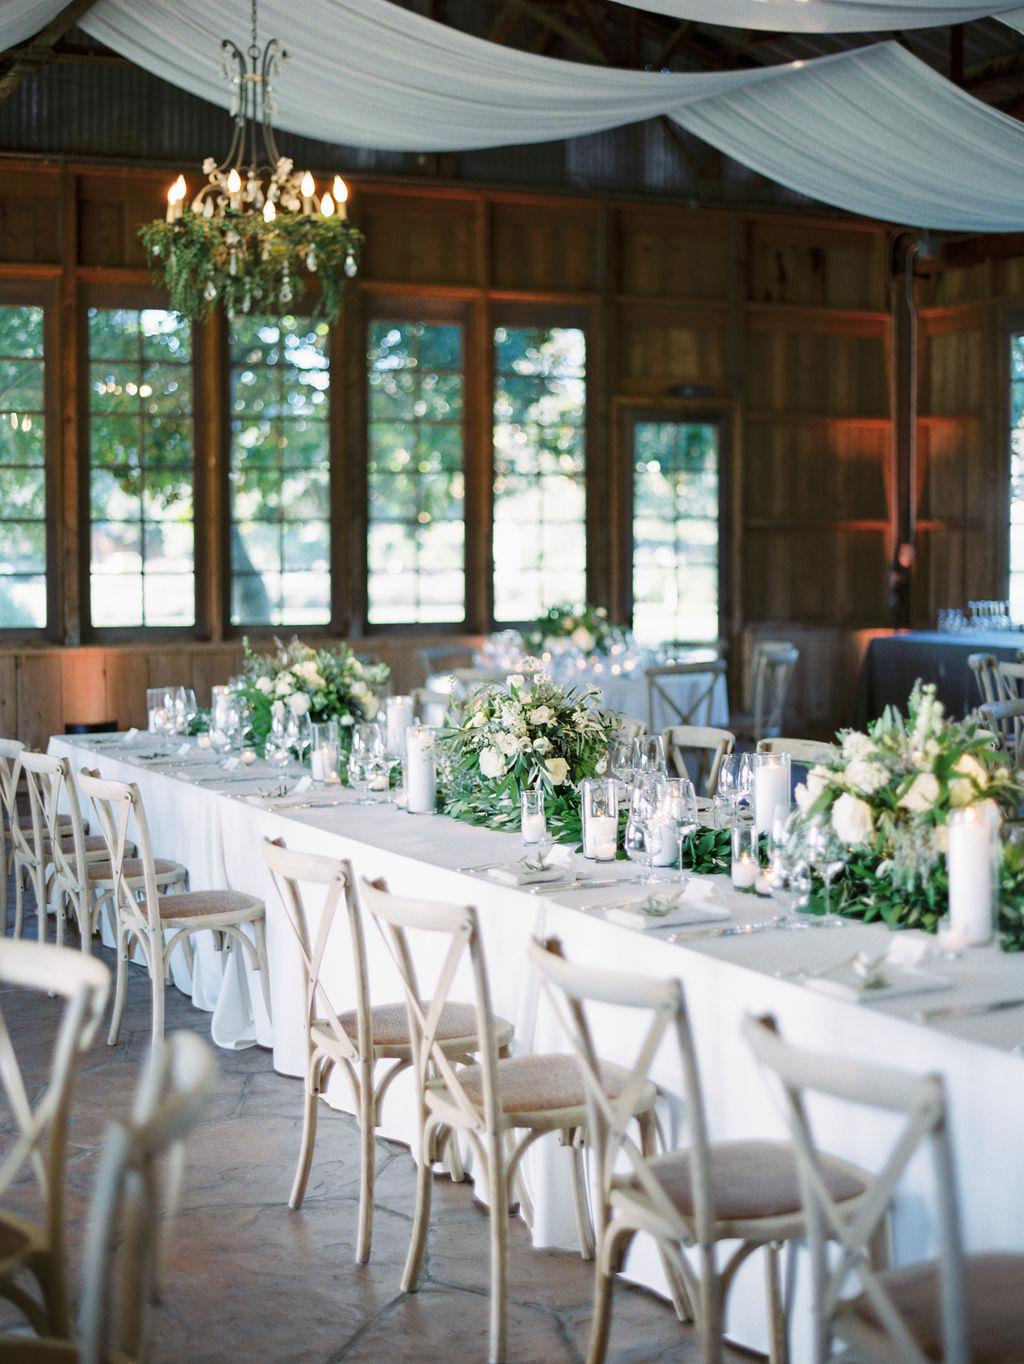 alegria-by-design-wedding-planner-planning-event-design-coordinator-day-of-month-crossroads-estate-garden-vineyard-firestone-barn-location-rustic-santa-barbara (1 (17).JPG